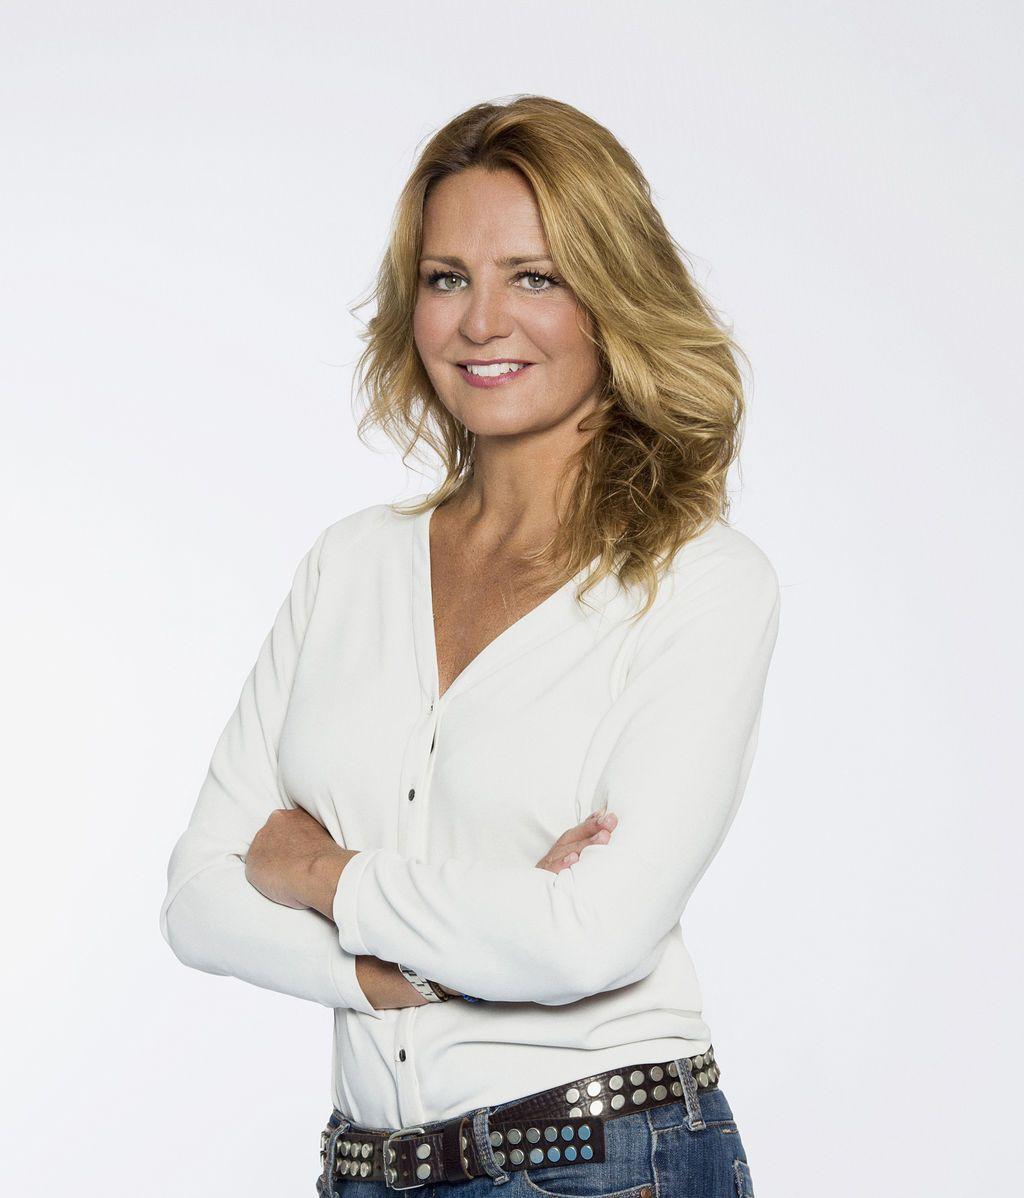 Ana Bustamante, Directora General de Mediterráneo Mediaset España Group